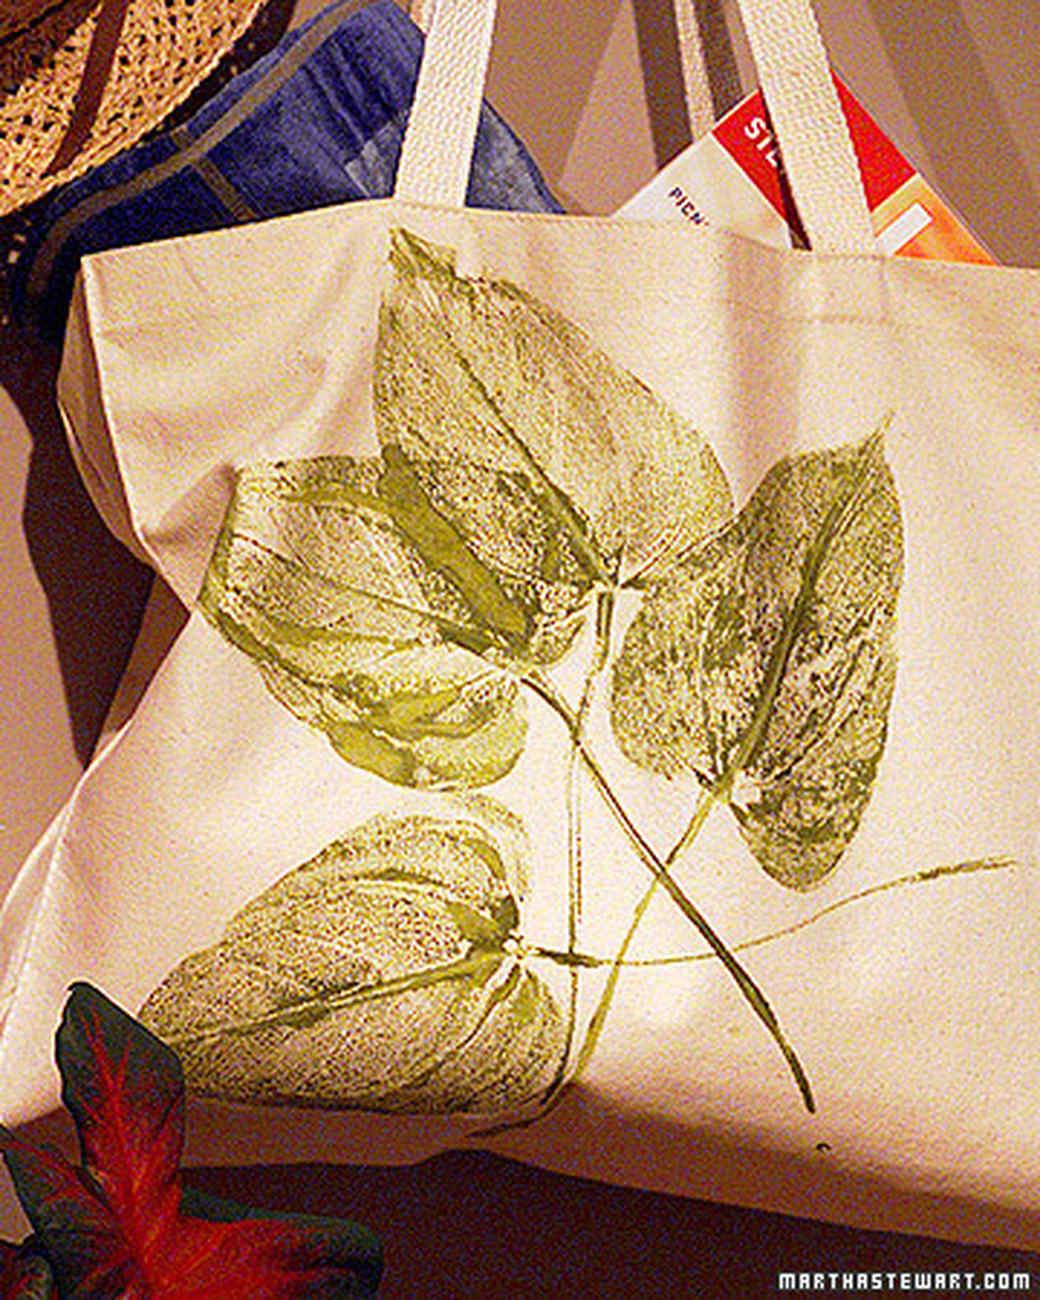 Martha Stewart Fabric Book Cover : Leaf print tote bag martha stewart